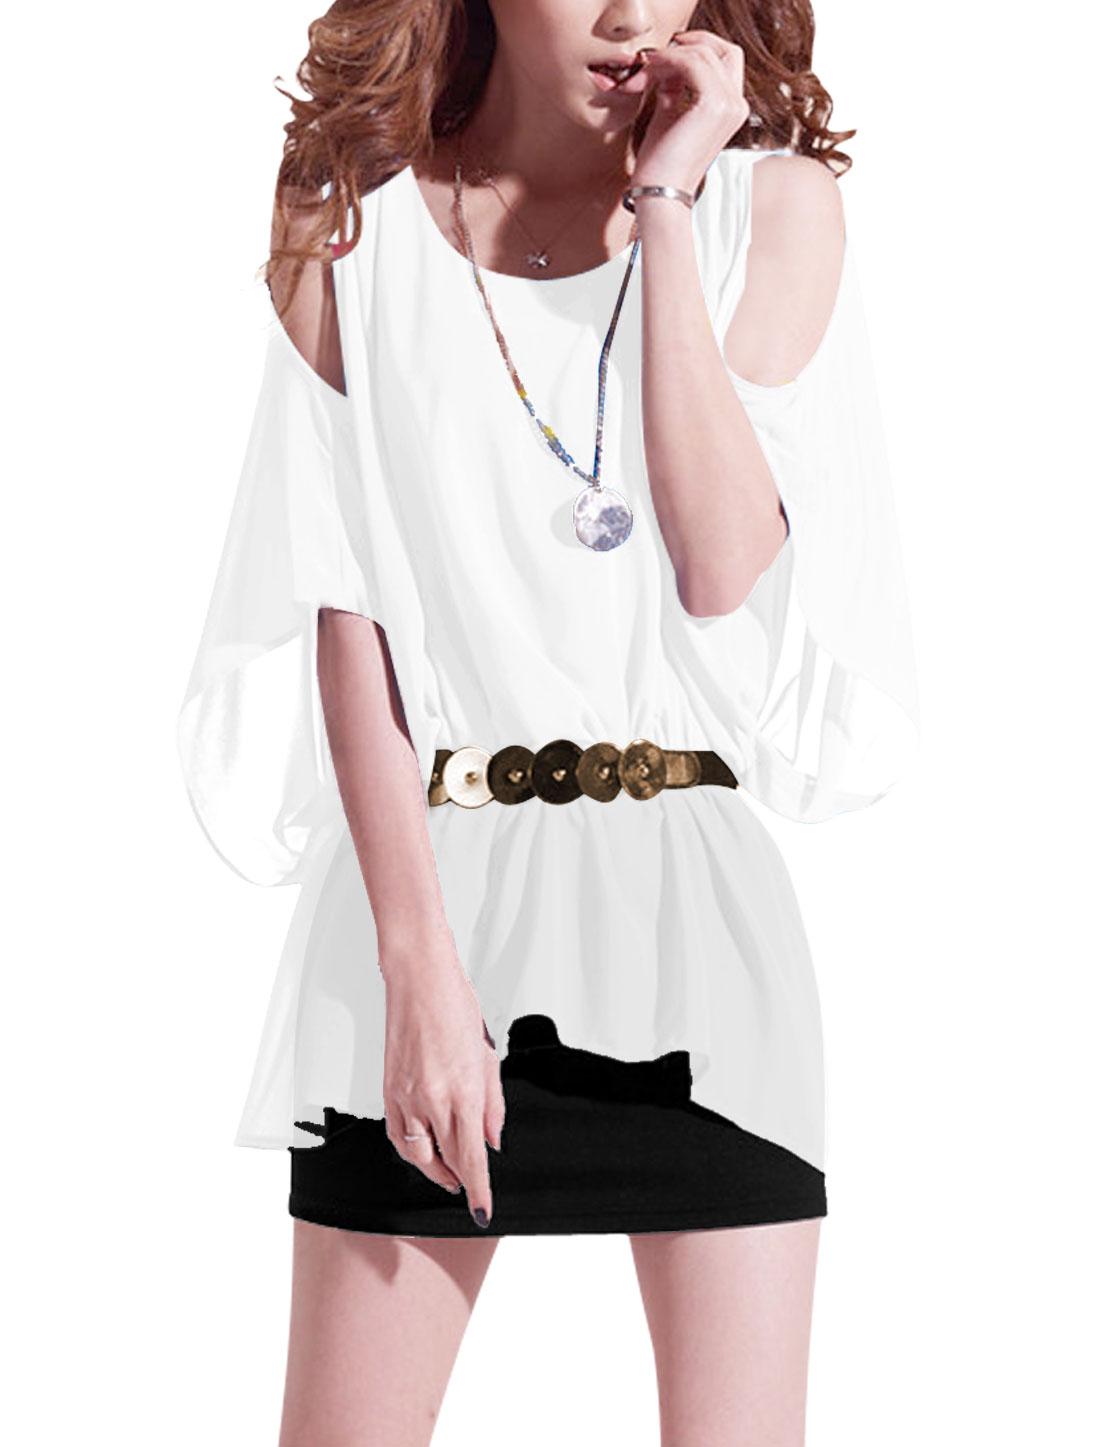 Lady White Black Round Neck Cut Out Shoulder Chic Blouson Dress w Waist Strap S